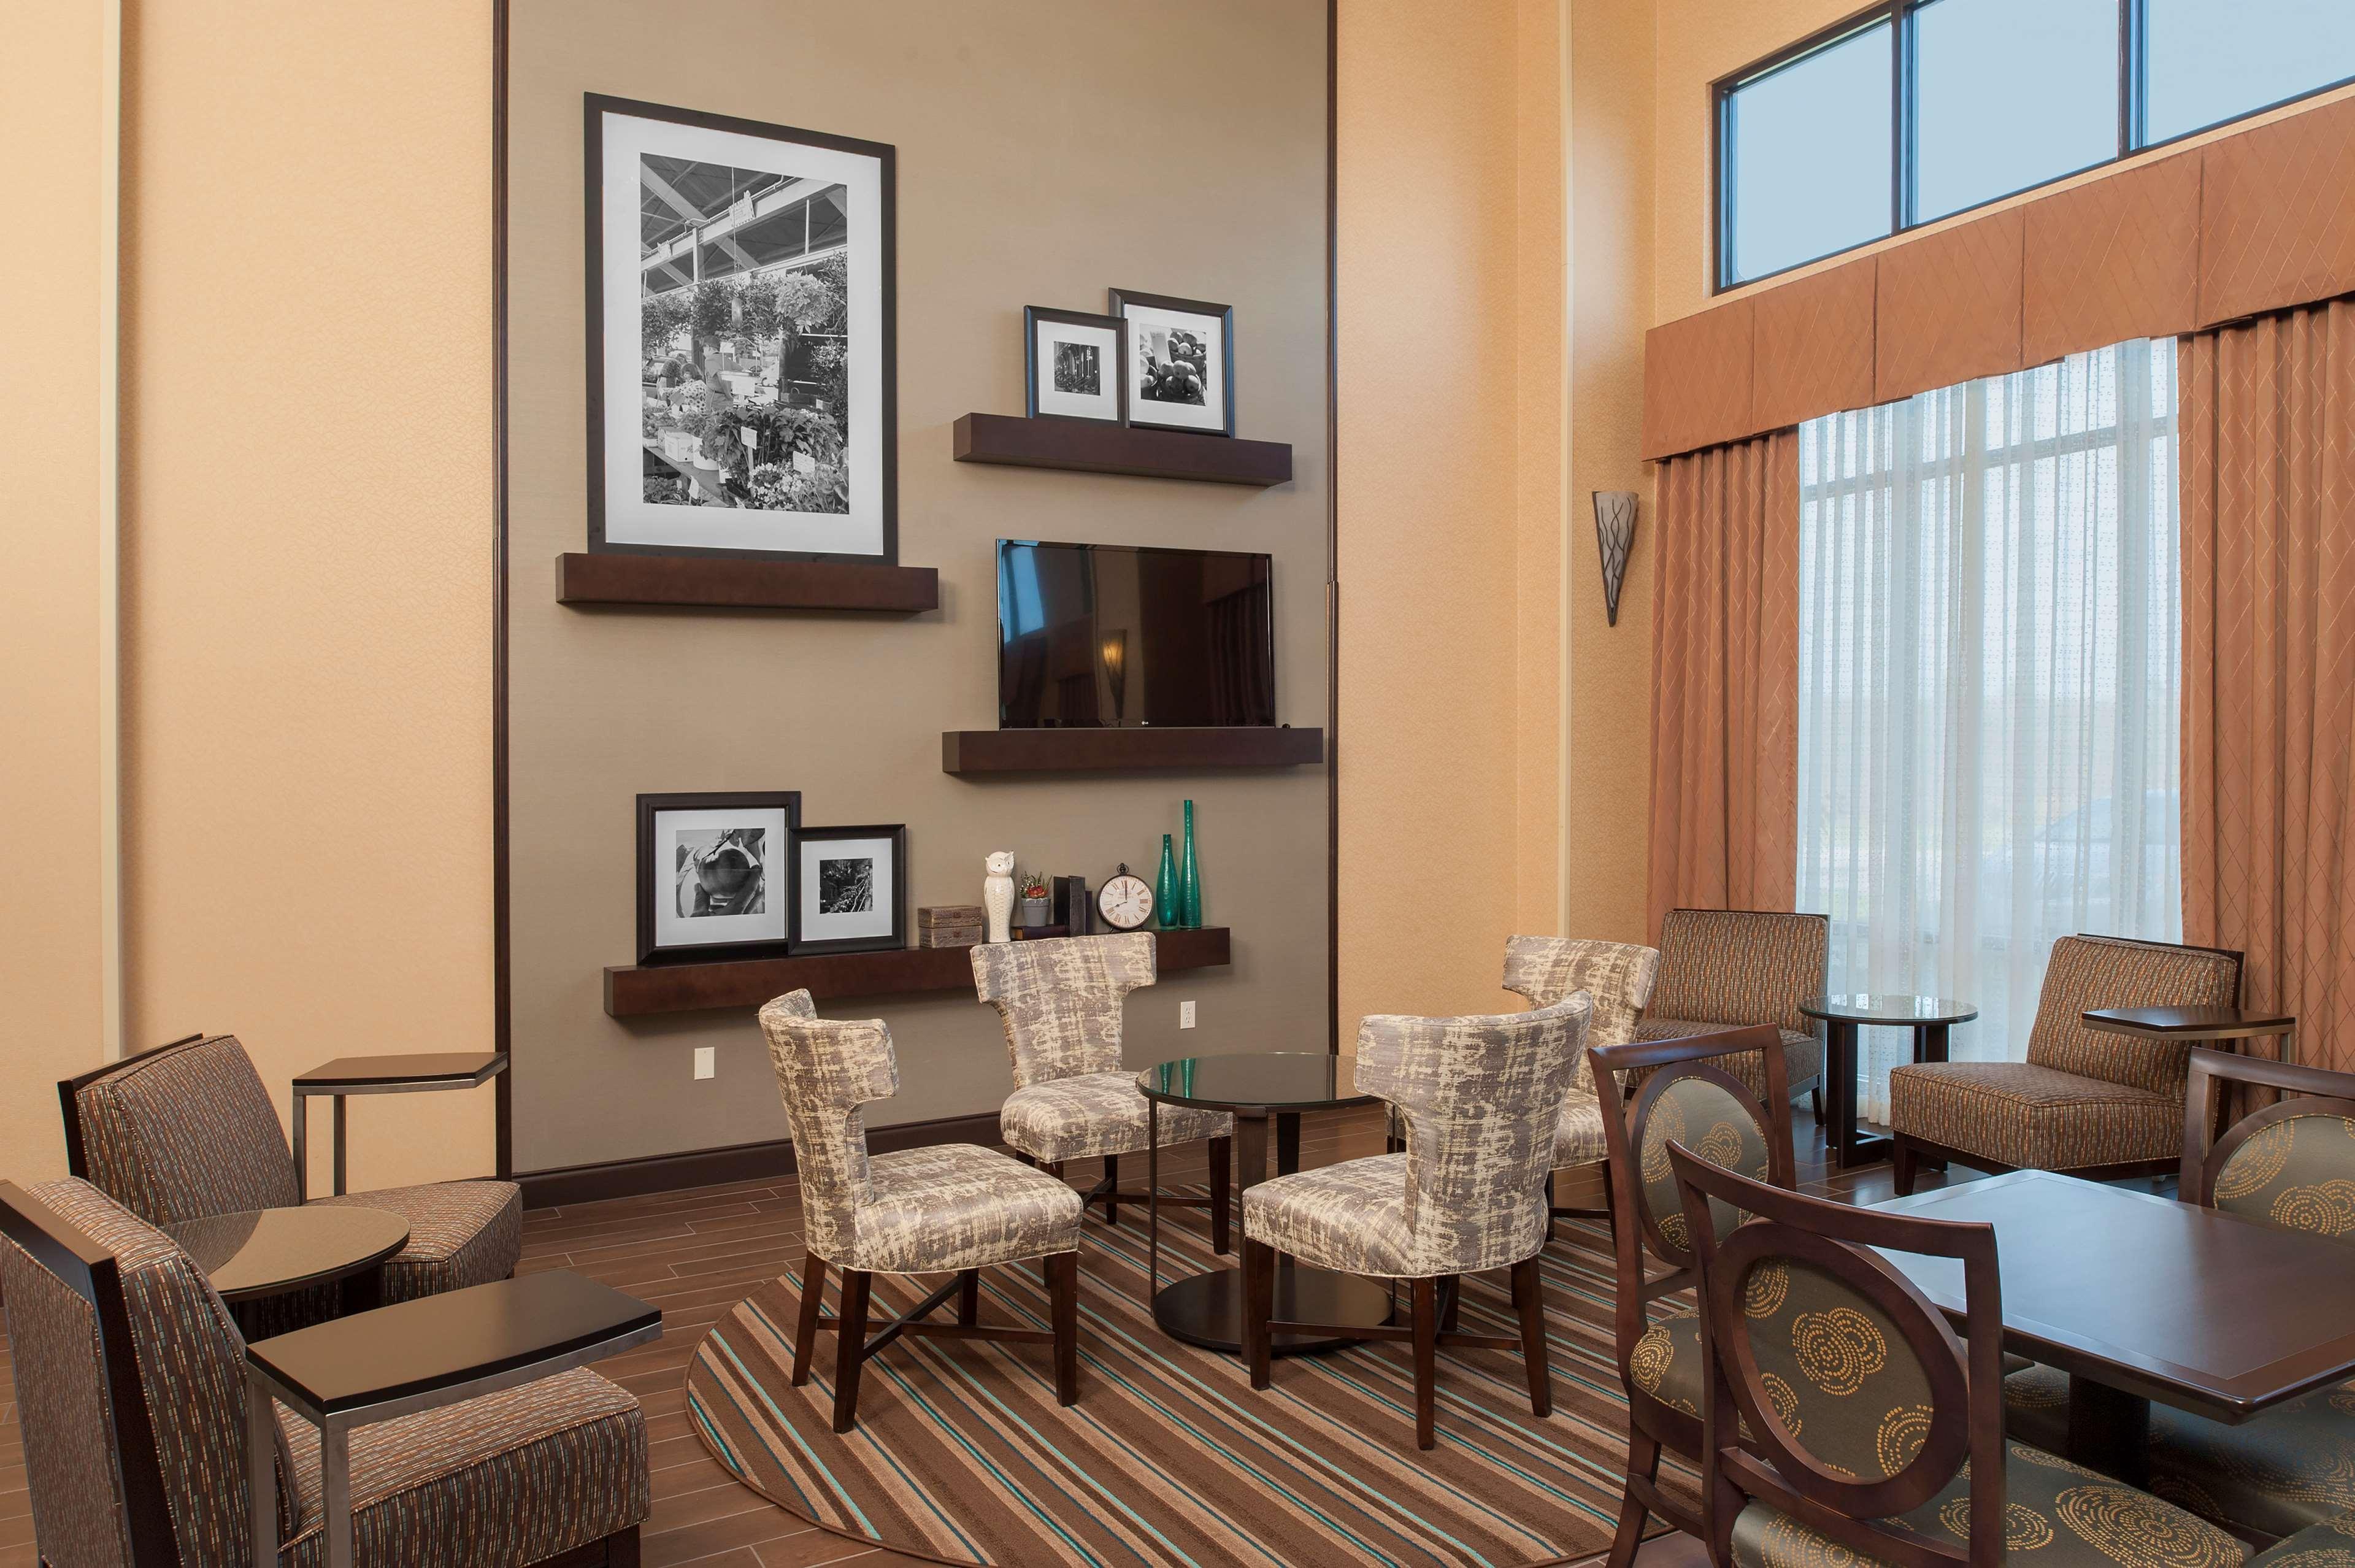 Hampton Inn & Suites Grand Rapids-Airport 28th St image 2